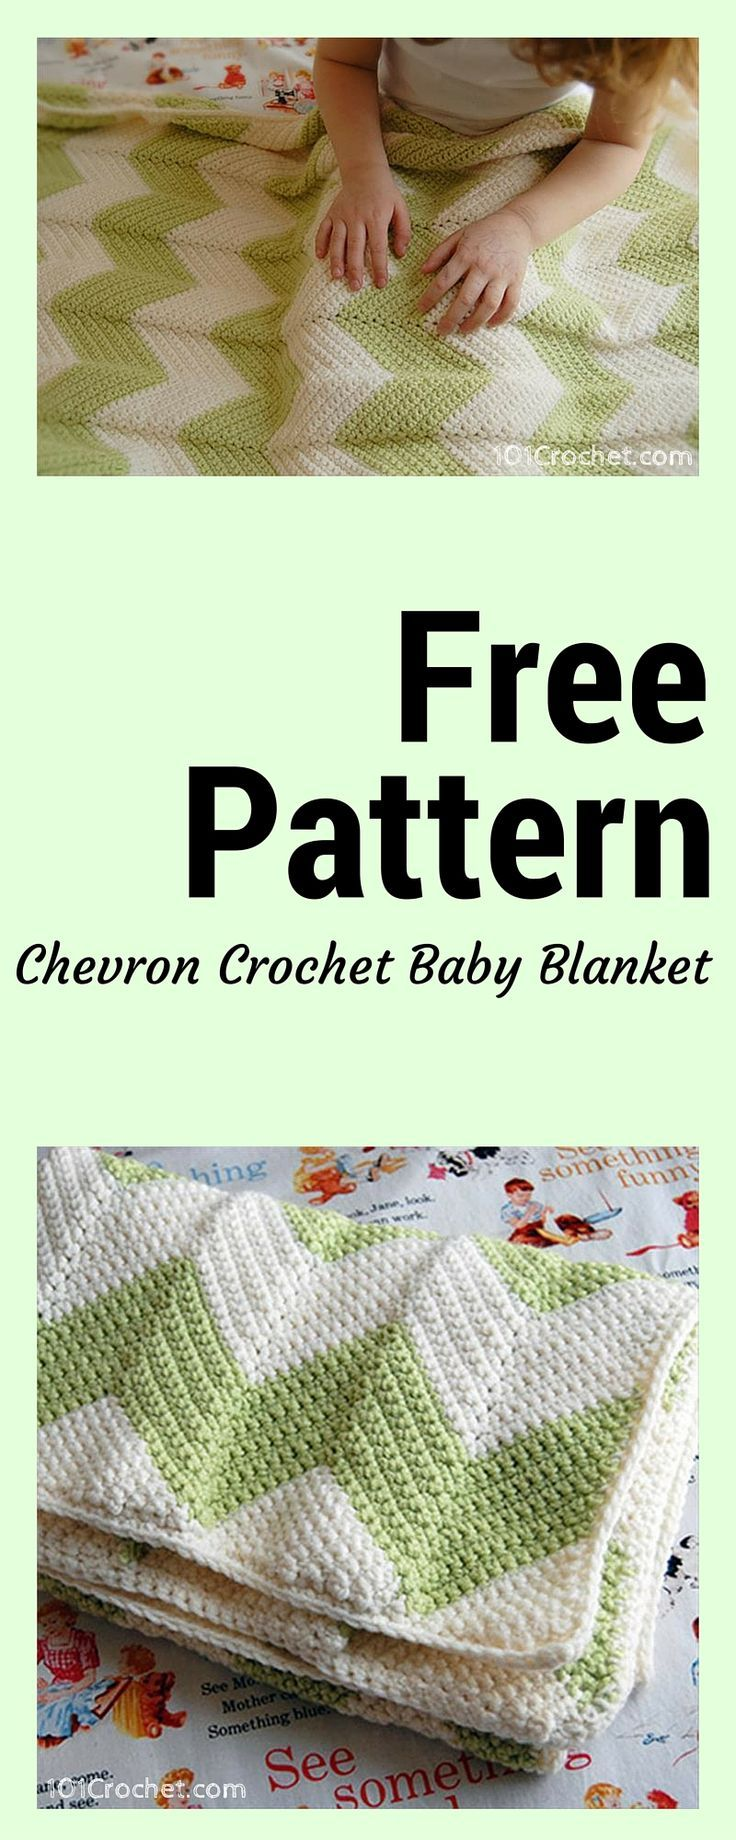 Free Chevron Crochet Baby Blanket Pattern | Chevron crochet, Crochet ...